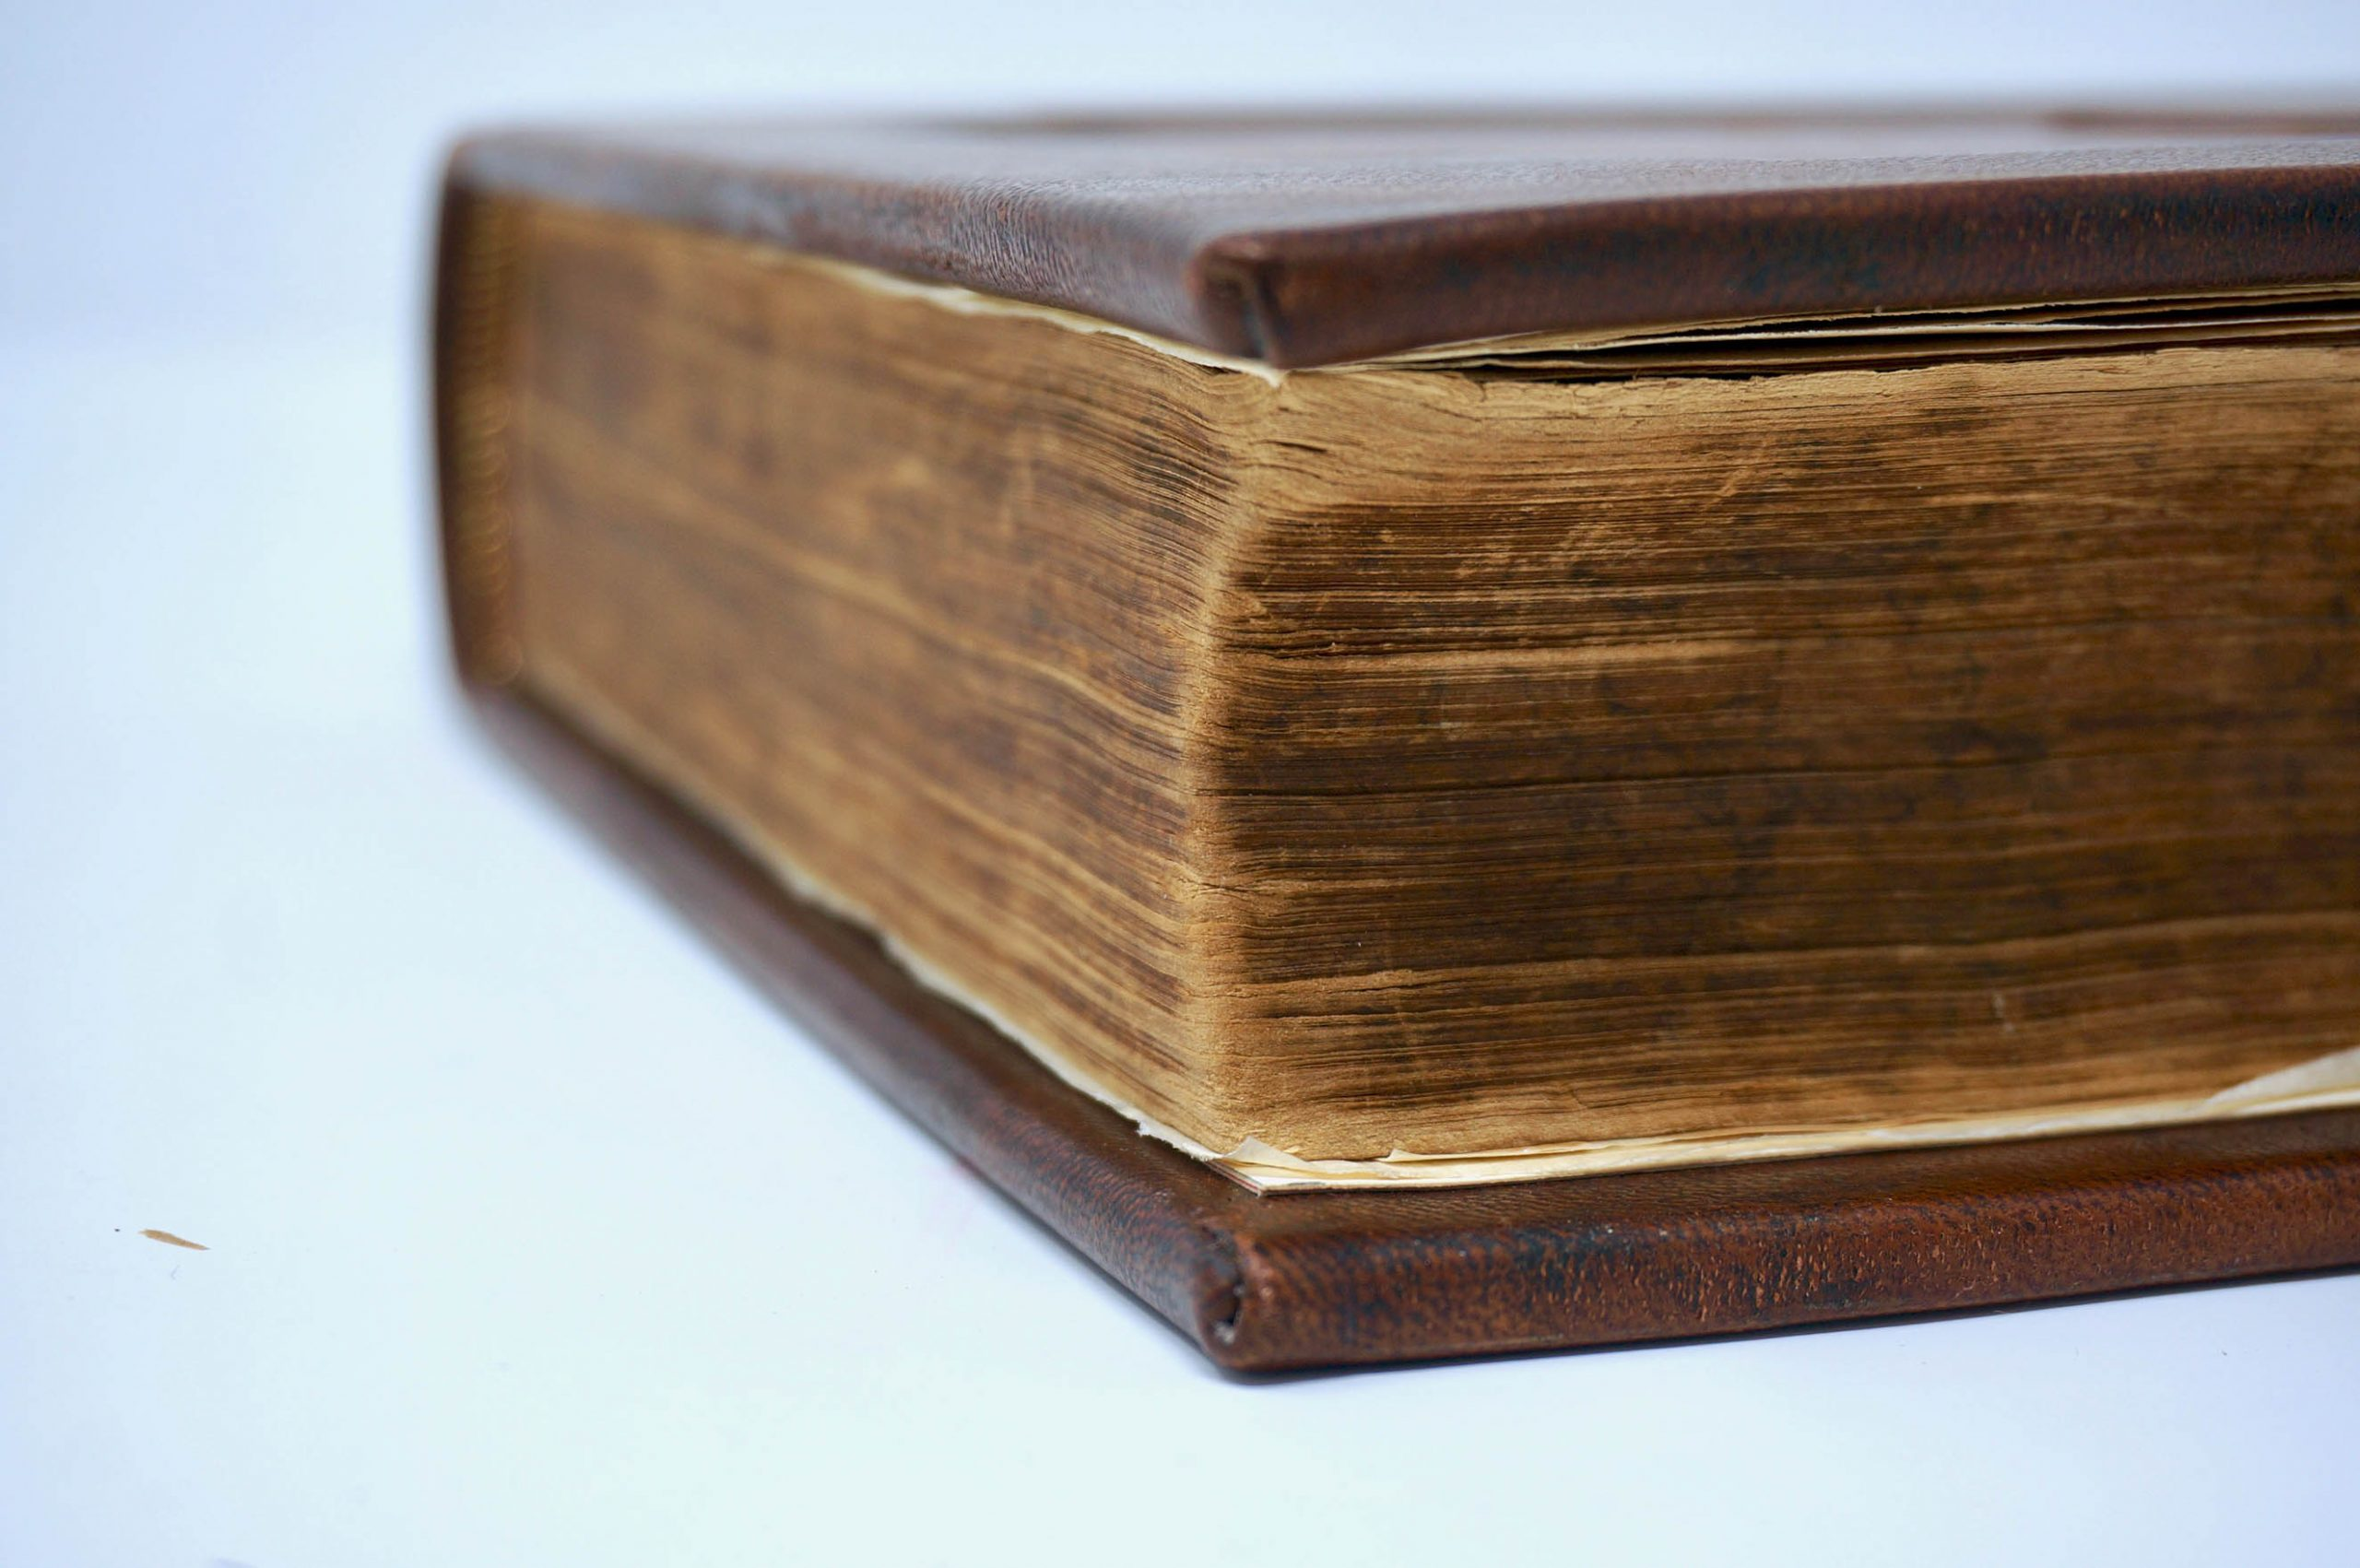 Bijbel Restoration Boston Harbor Bookbindery https://bostonharborbooks.com/